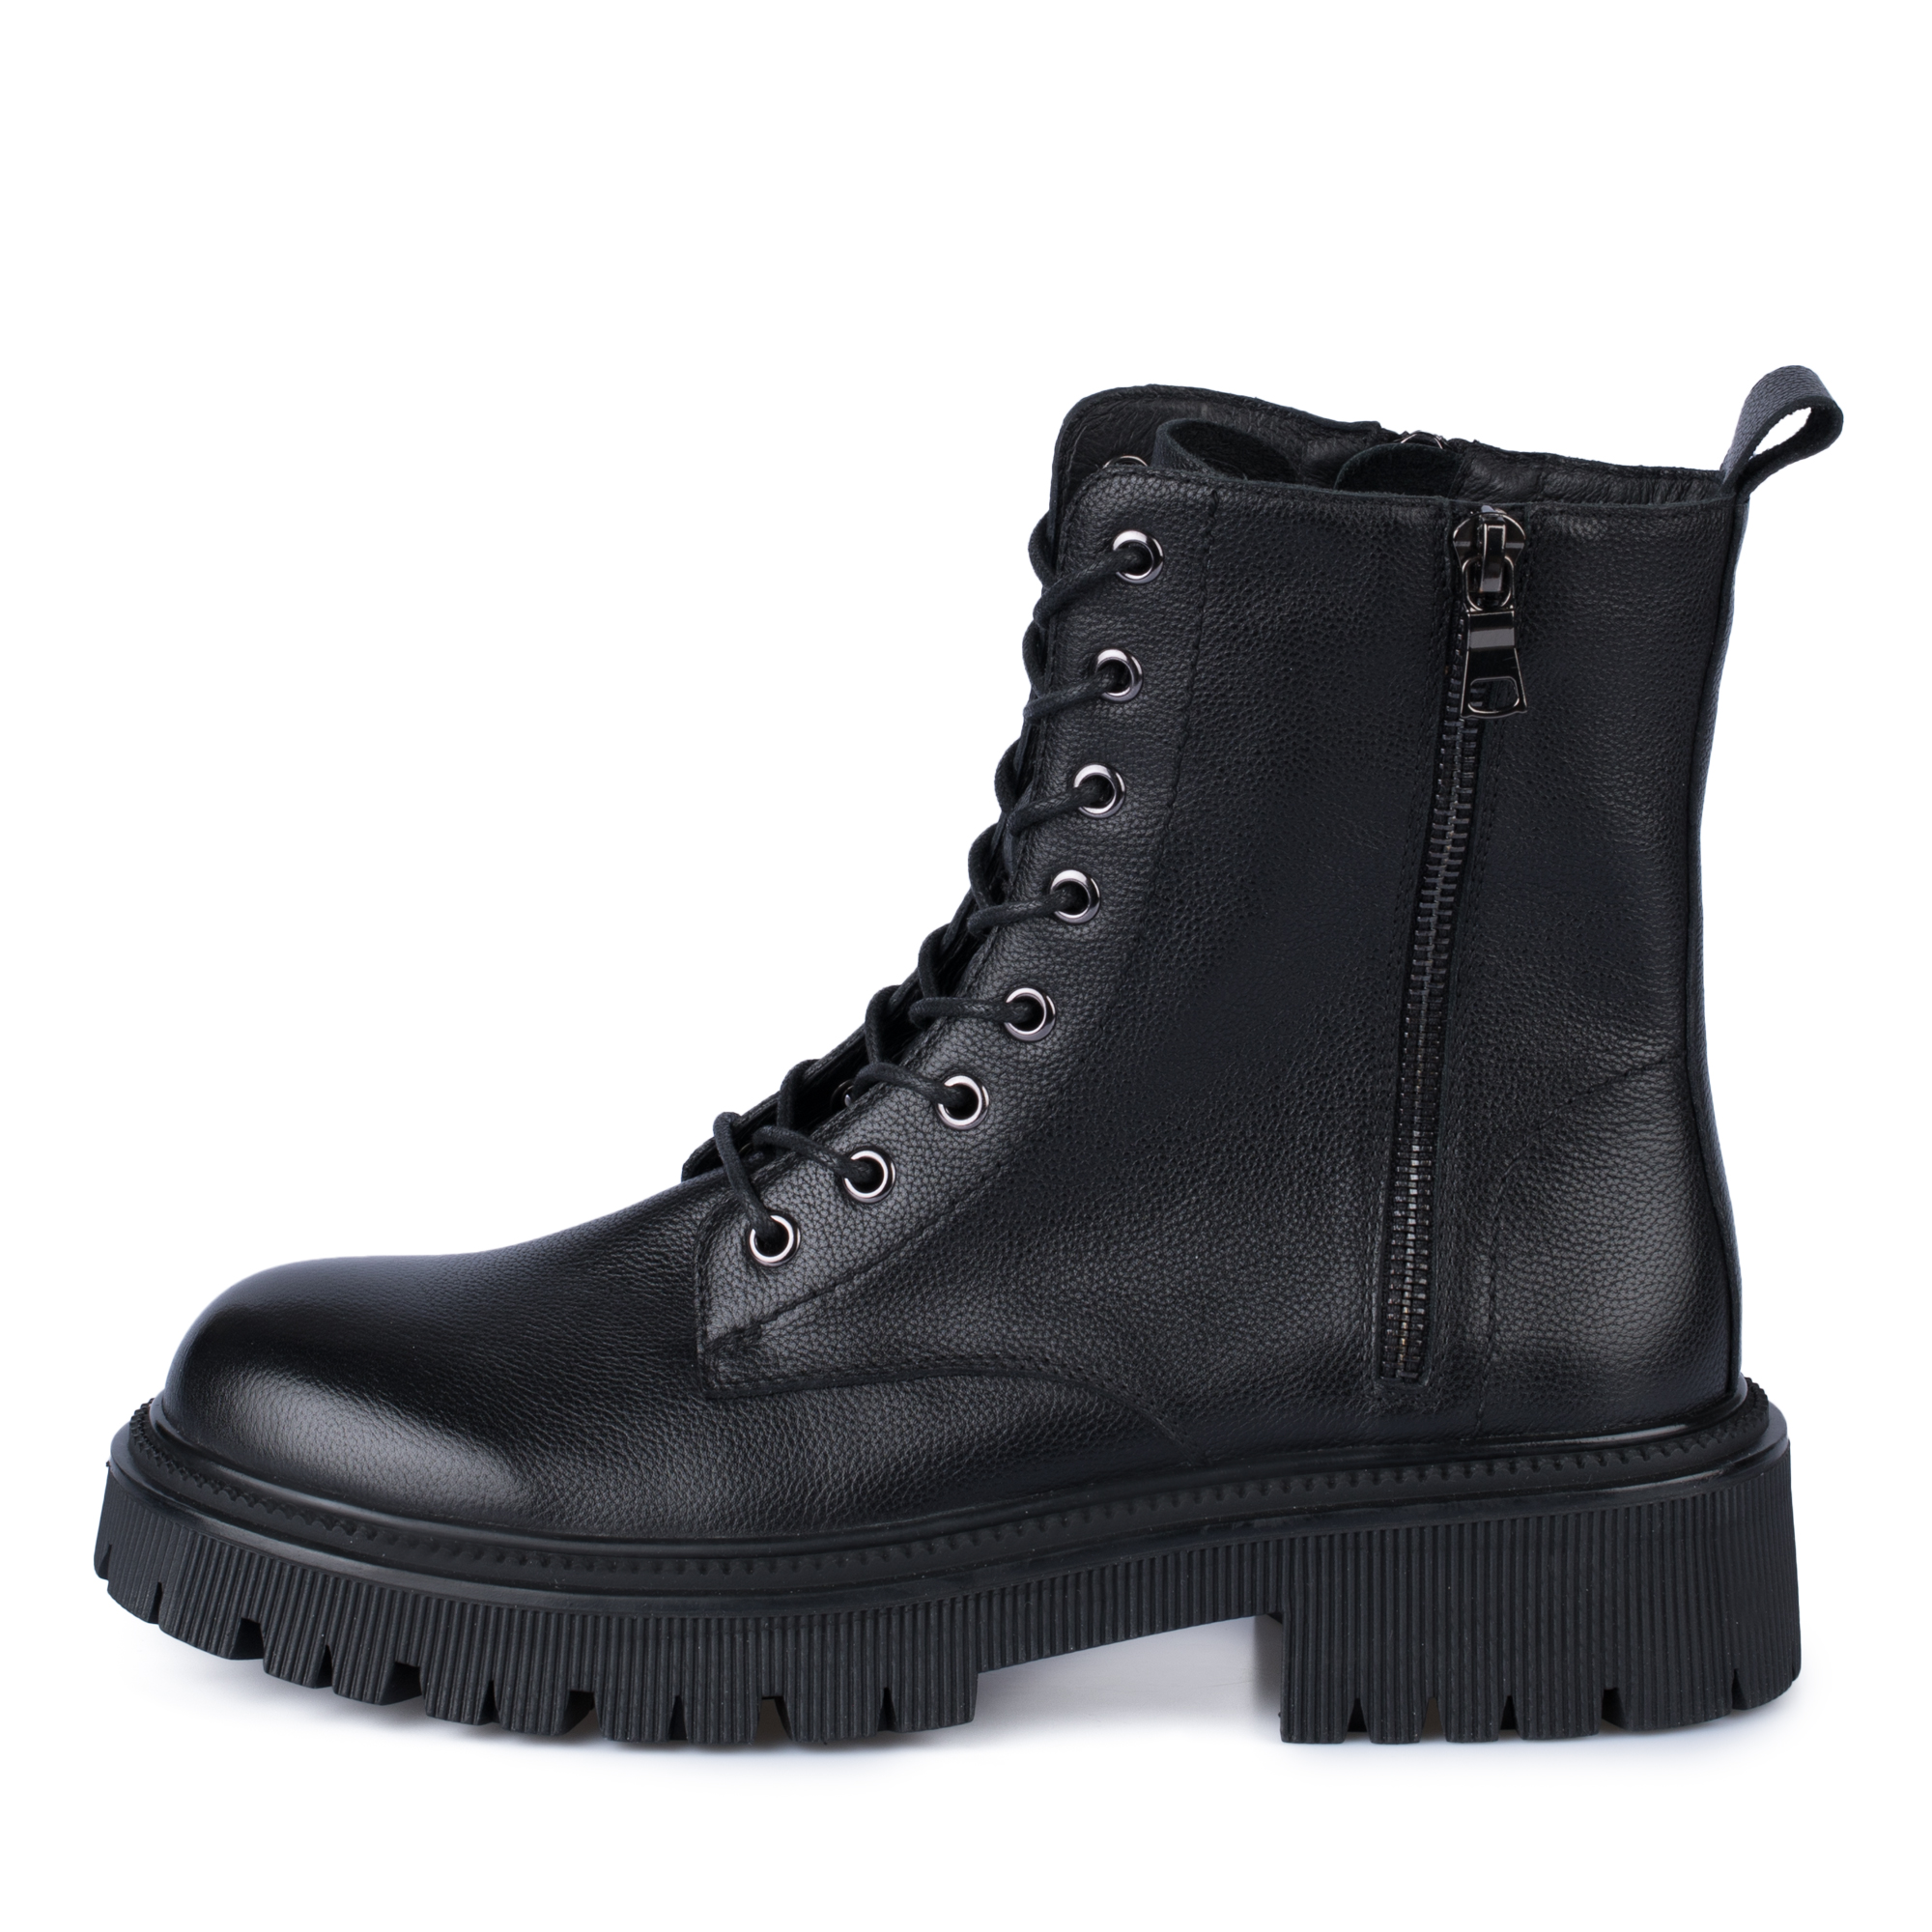 Ботинки Thomas Munz 058-983A-3102